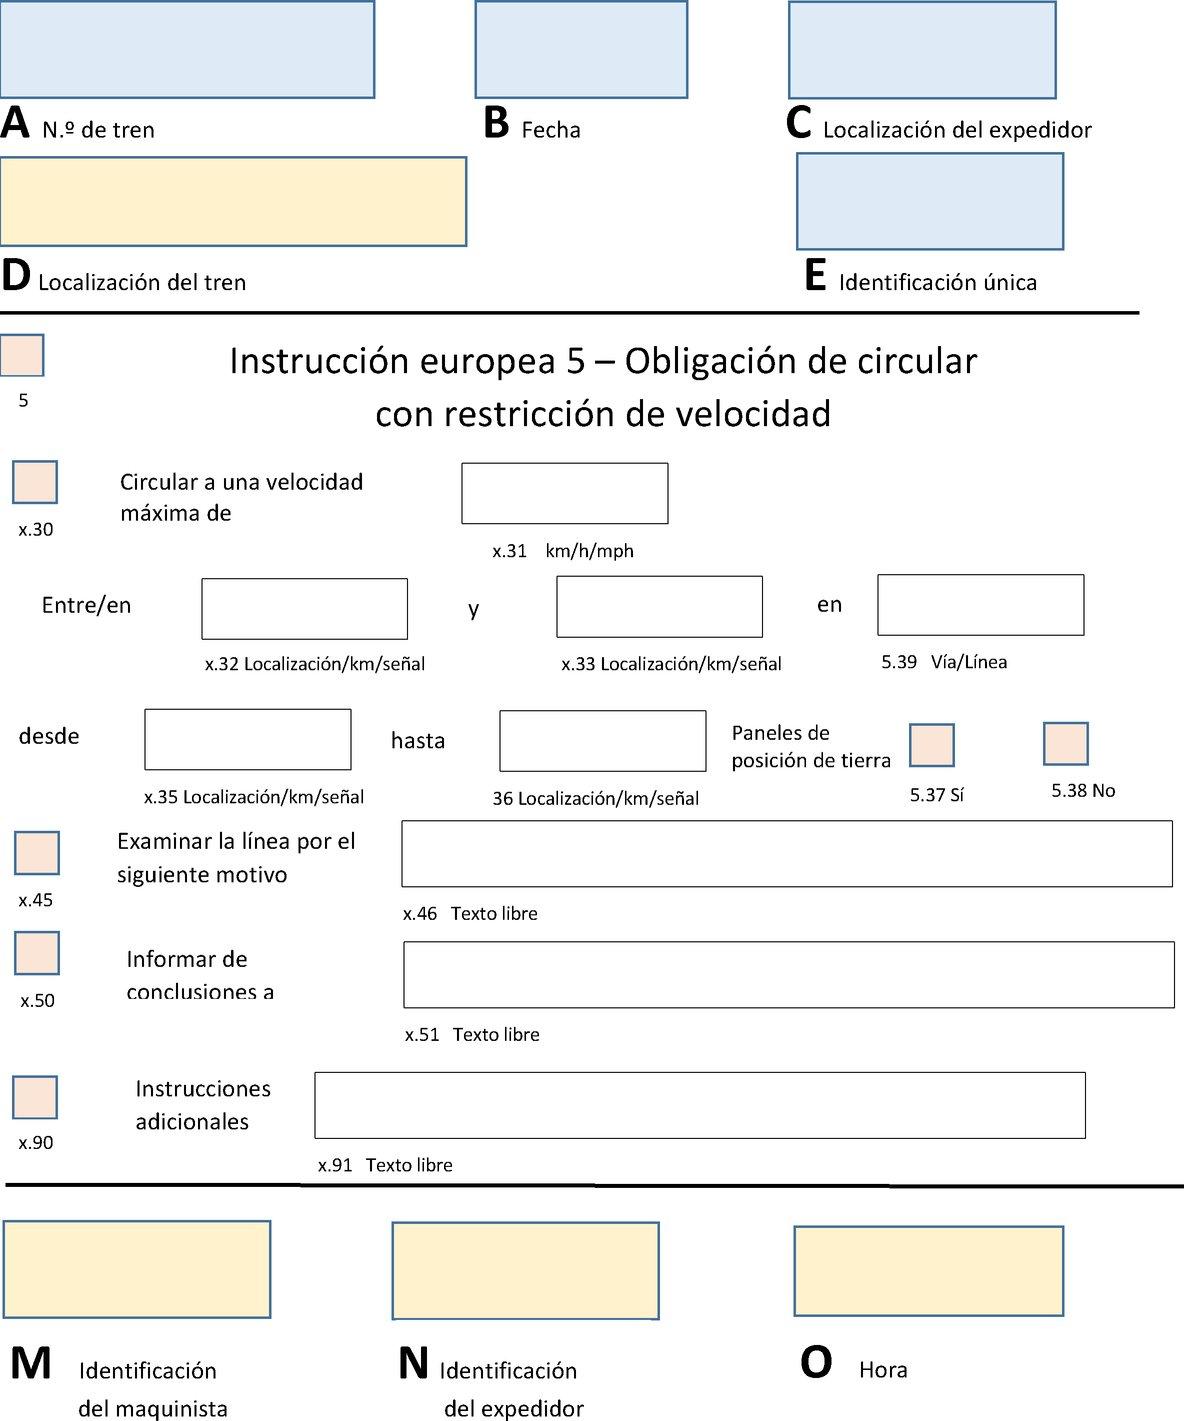 Imagen: https://eur-lex.europa.eu/resource.html?uri=uriserv:OJ.LI.2019.139.01.0005.01.SPA.xhtml.LI2019139ES.01005701.tif.jpg